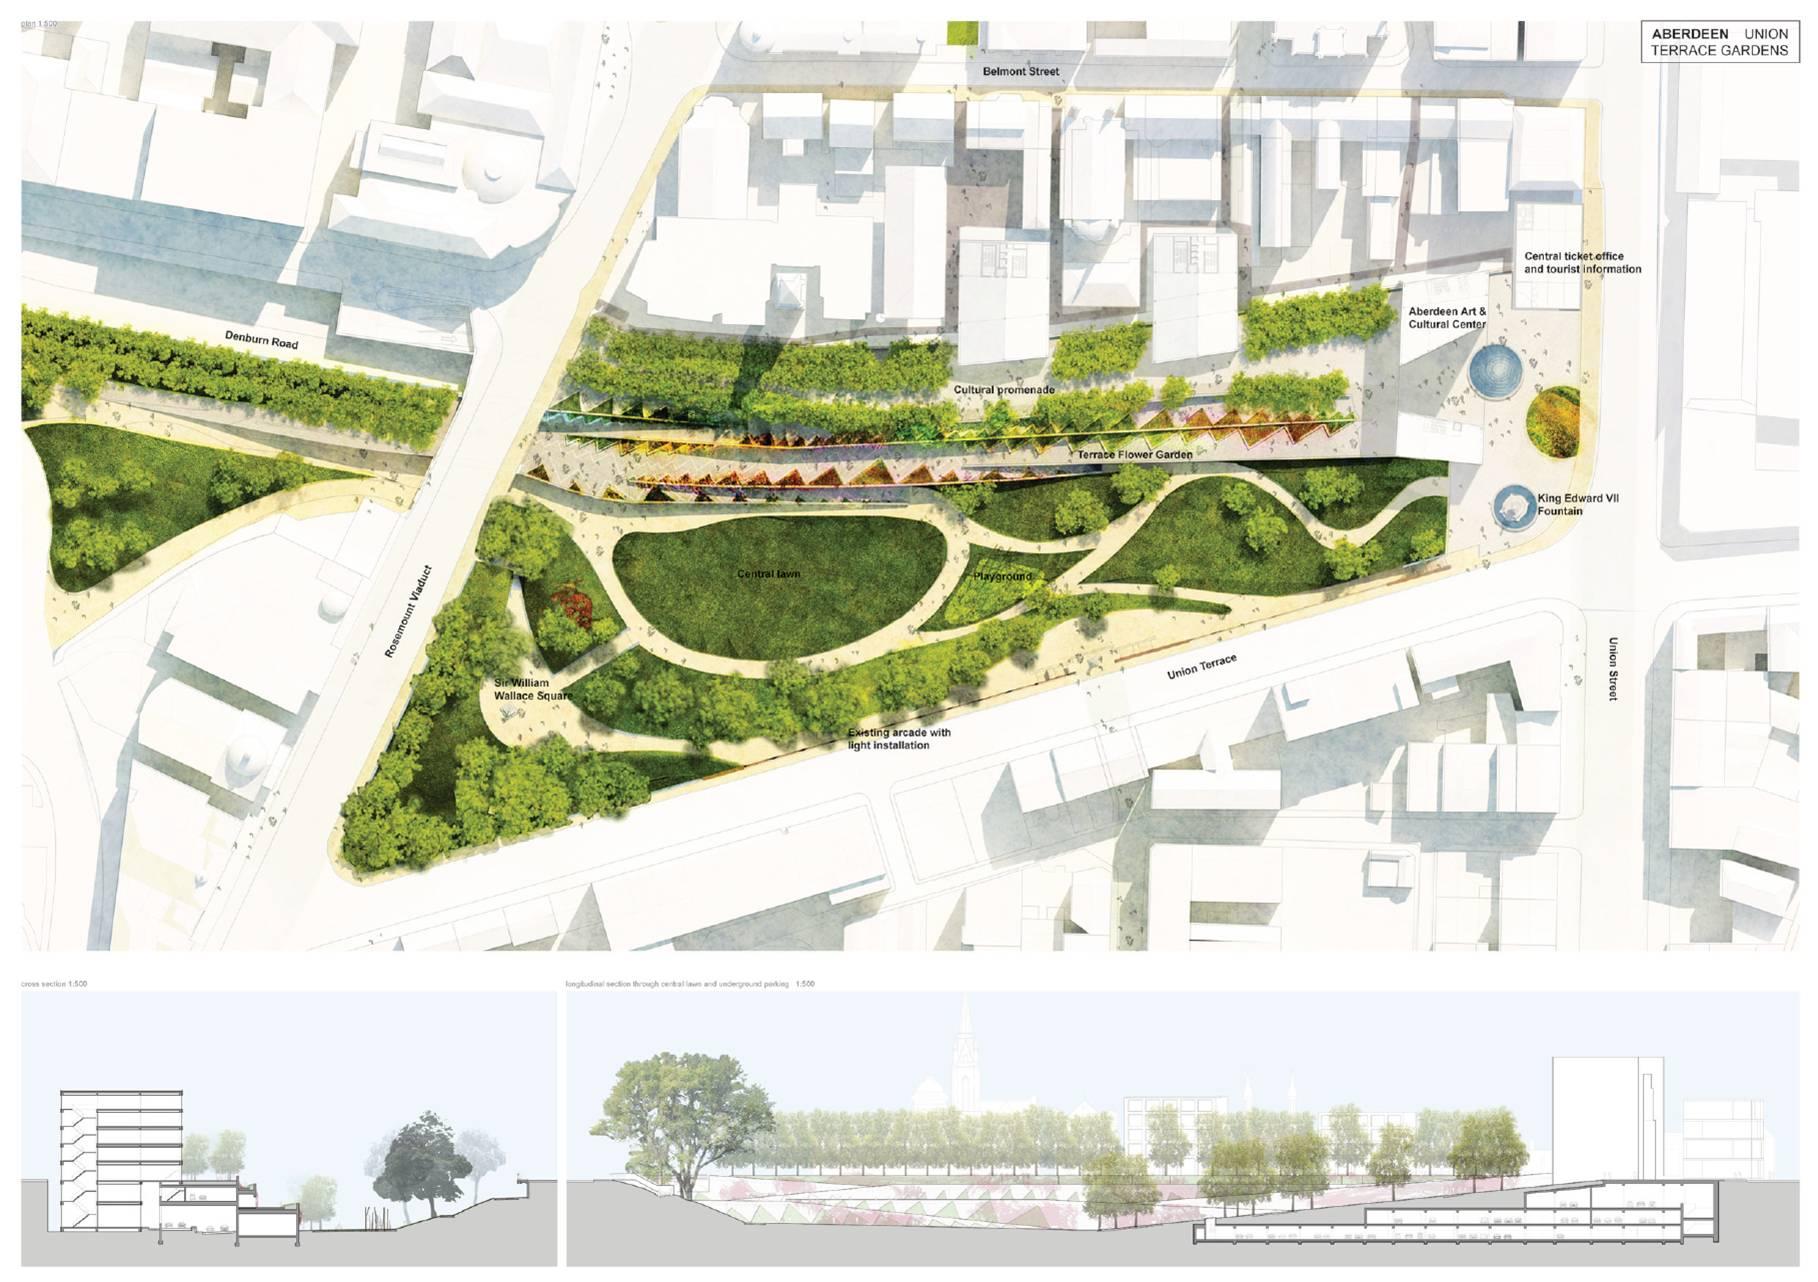 Finalista aberdeen city garden project west 8 for West 8 architecture